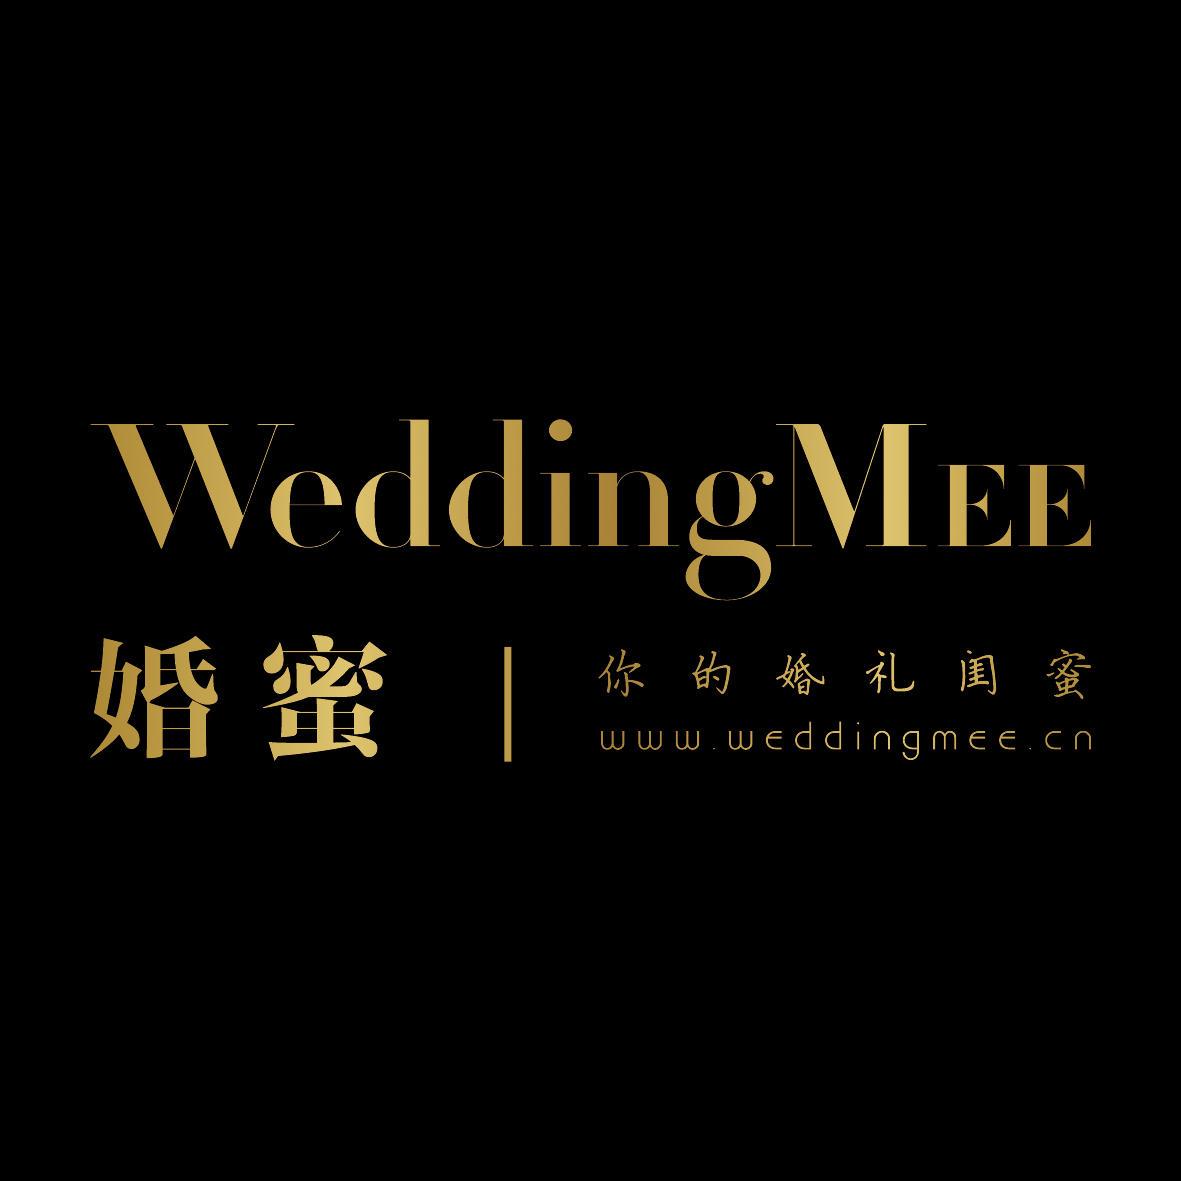 WeddingMEE婚蜜婚礼策划